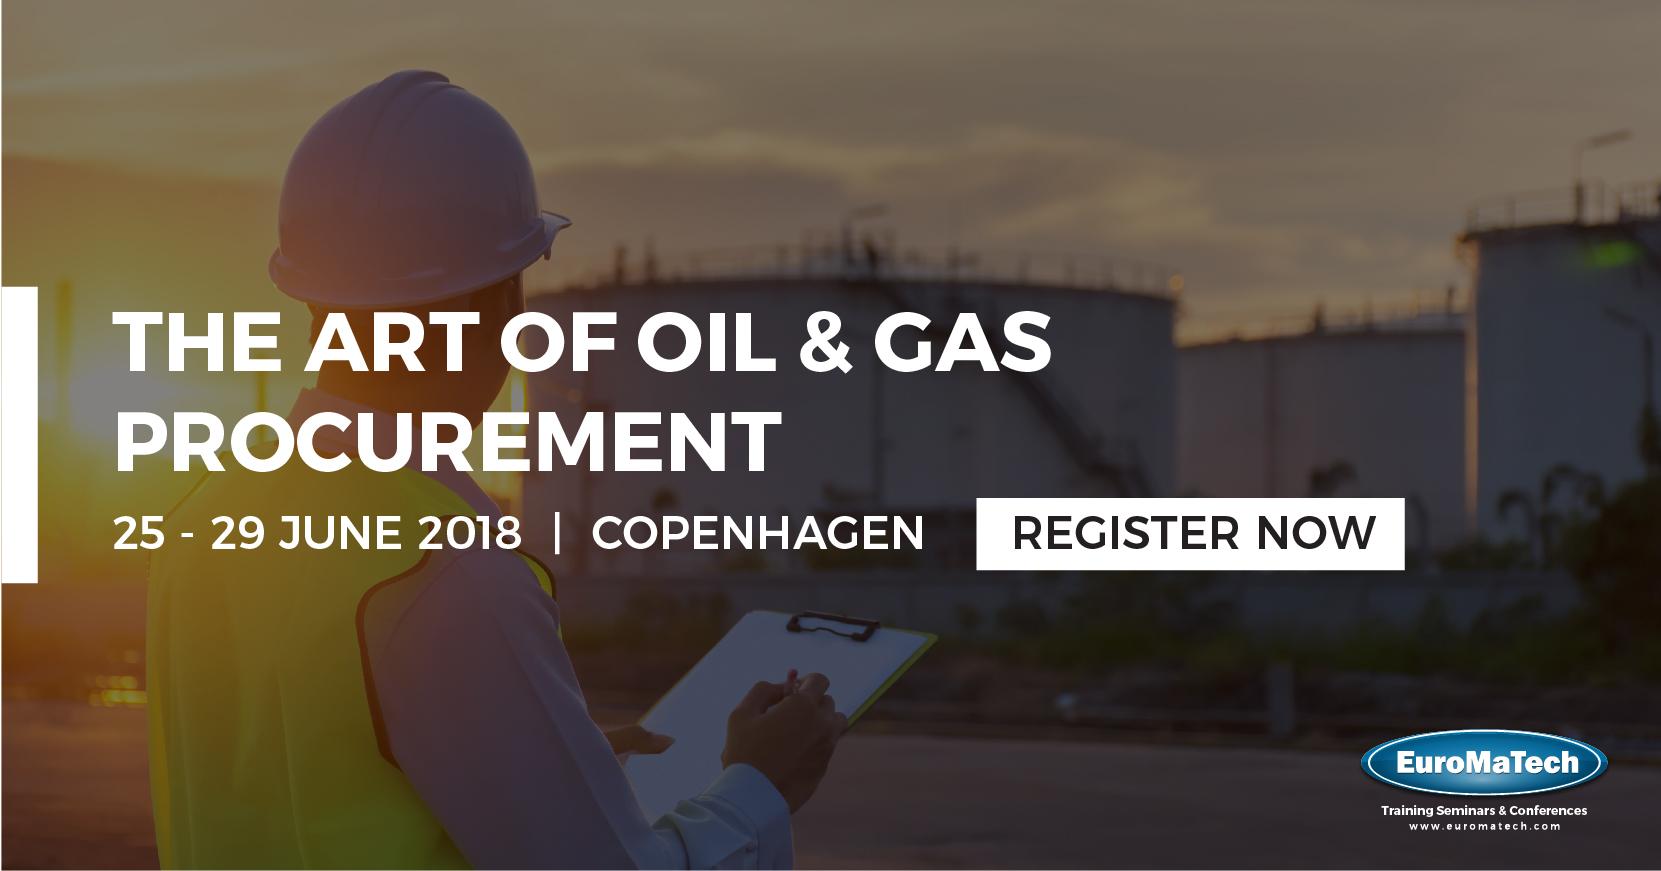 The Art of Oil & Gas Procurement Training Course